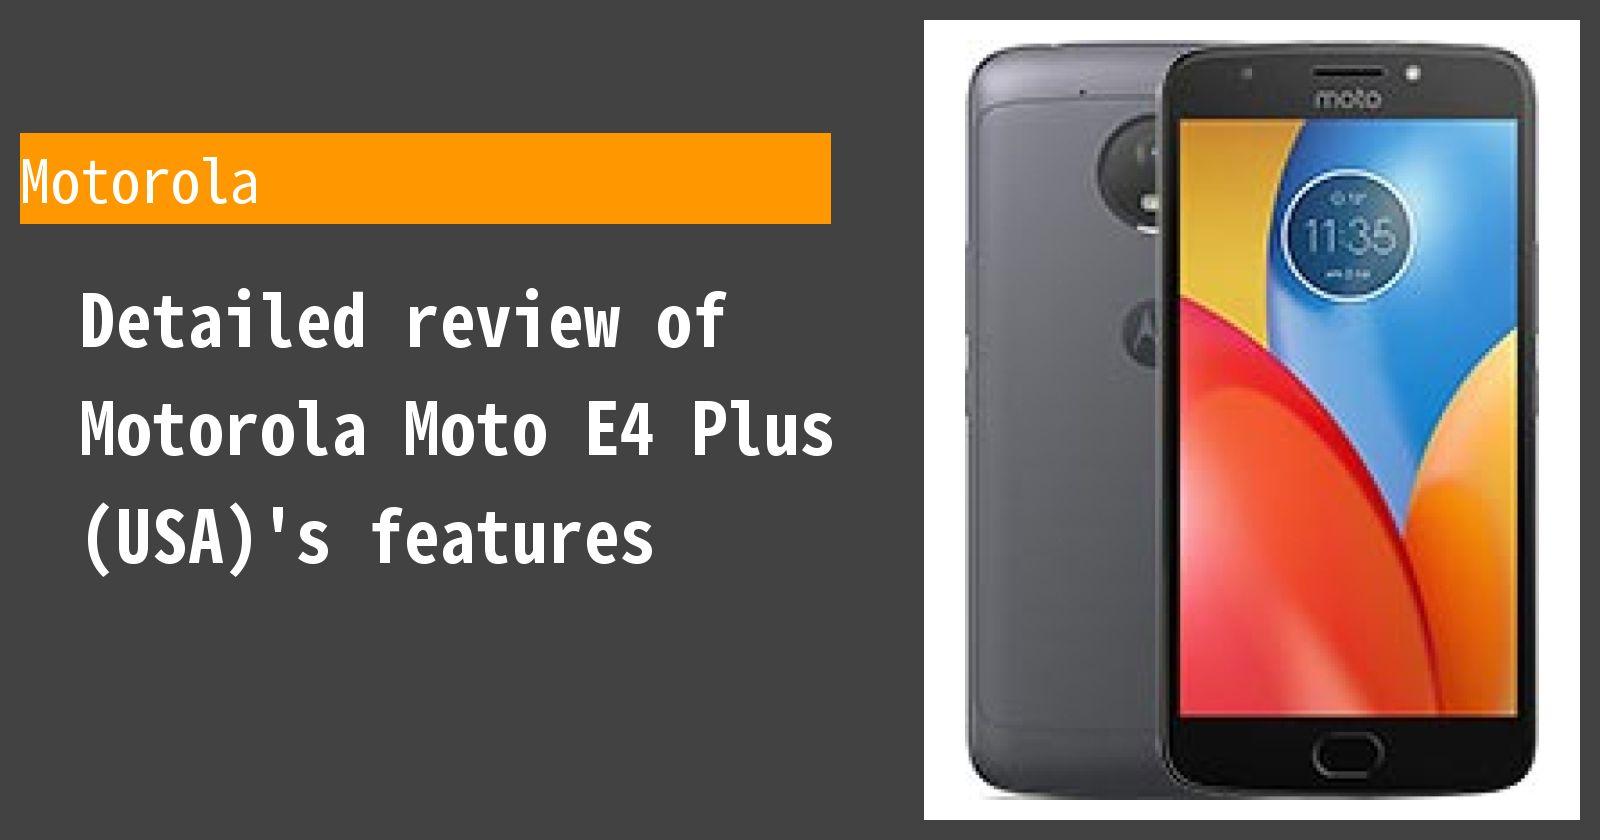 Detailed review of Motorola Moto E4 Plus (USA)'s features